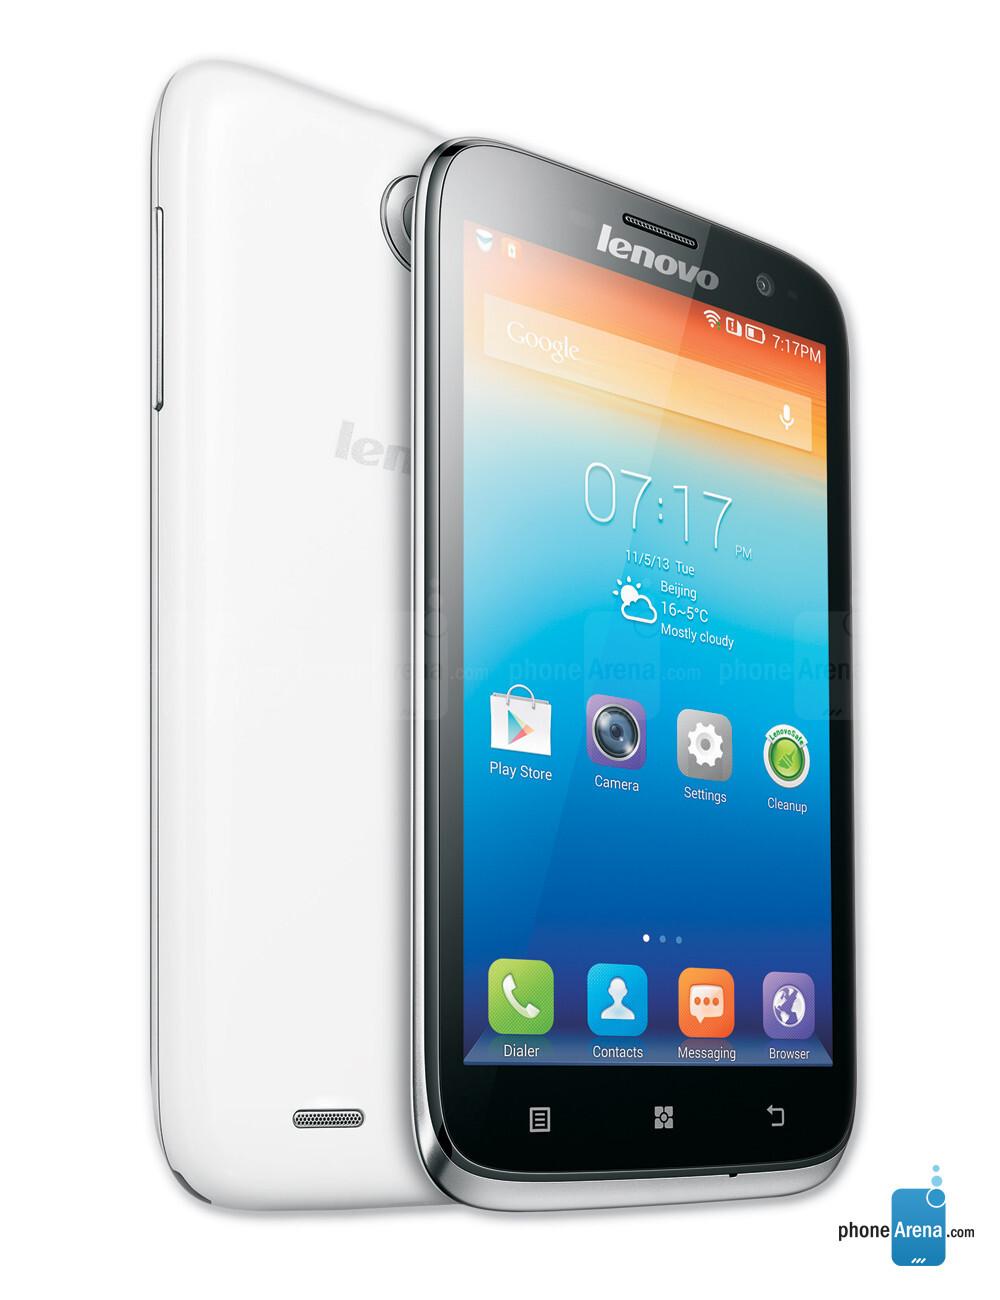 Lenovo ideaphone s820 8gb 3